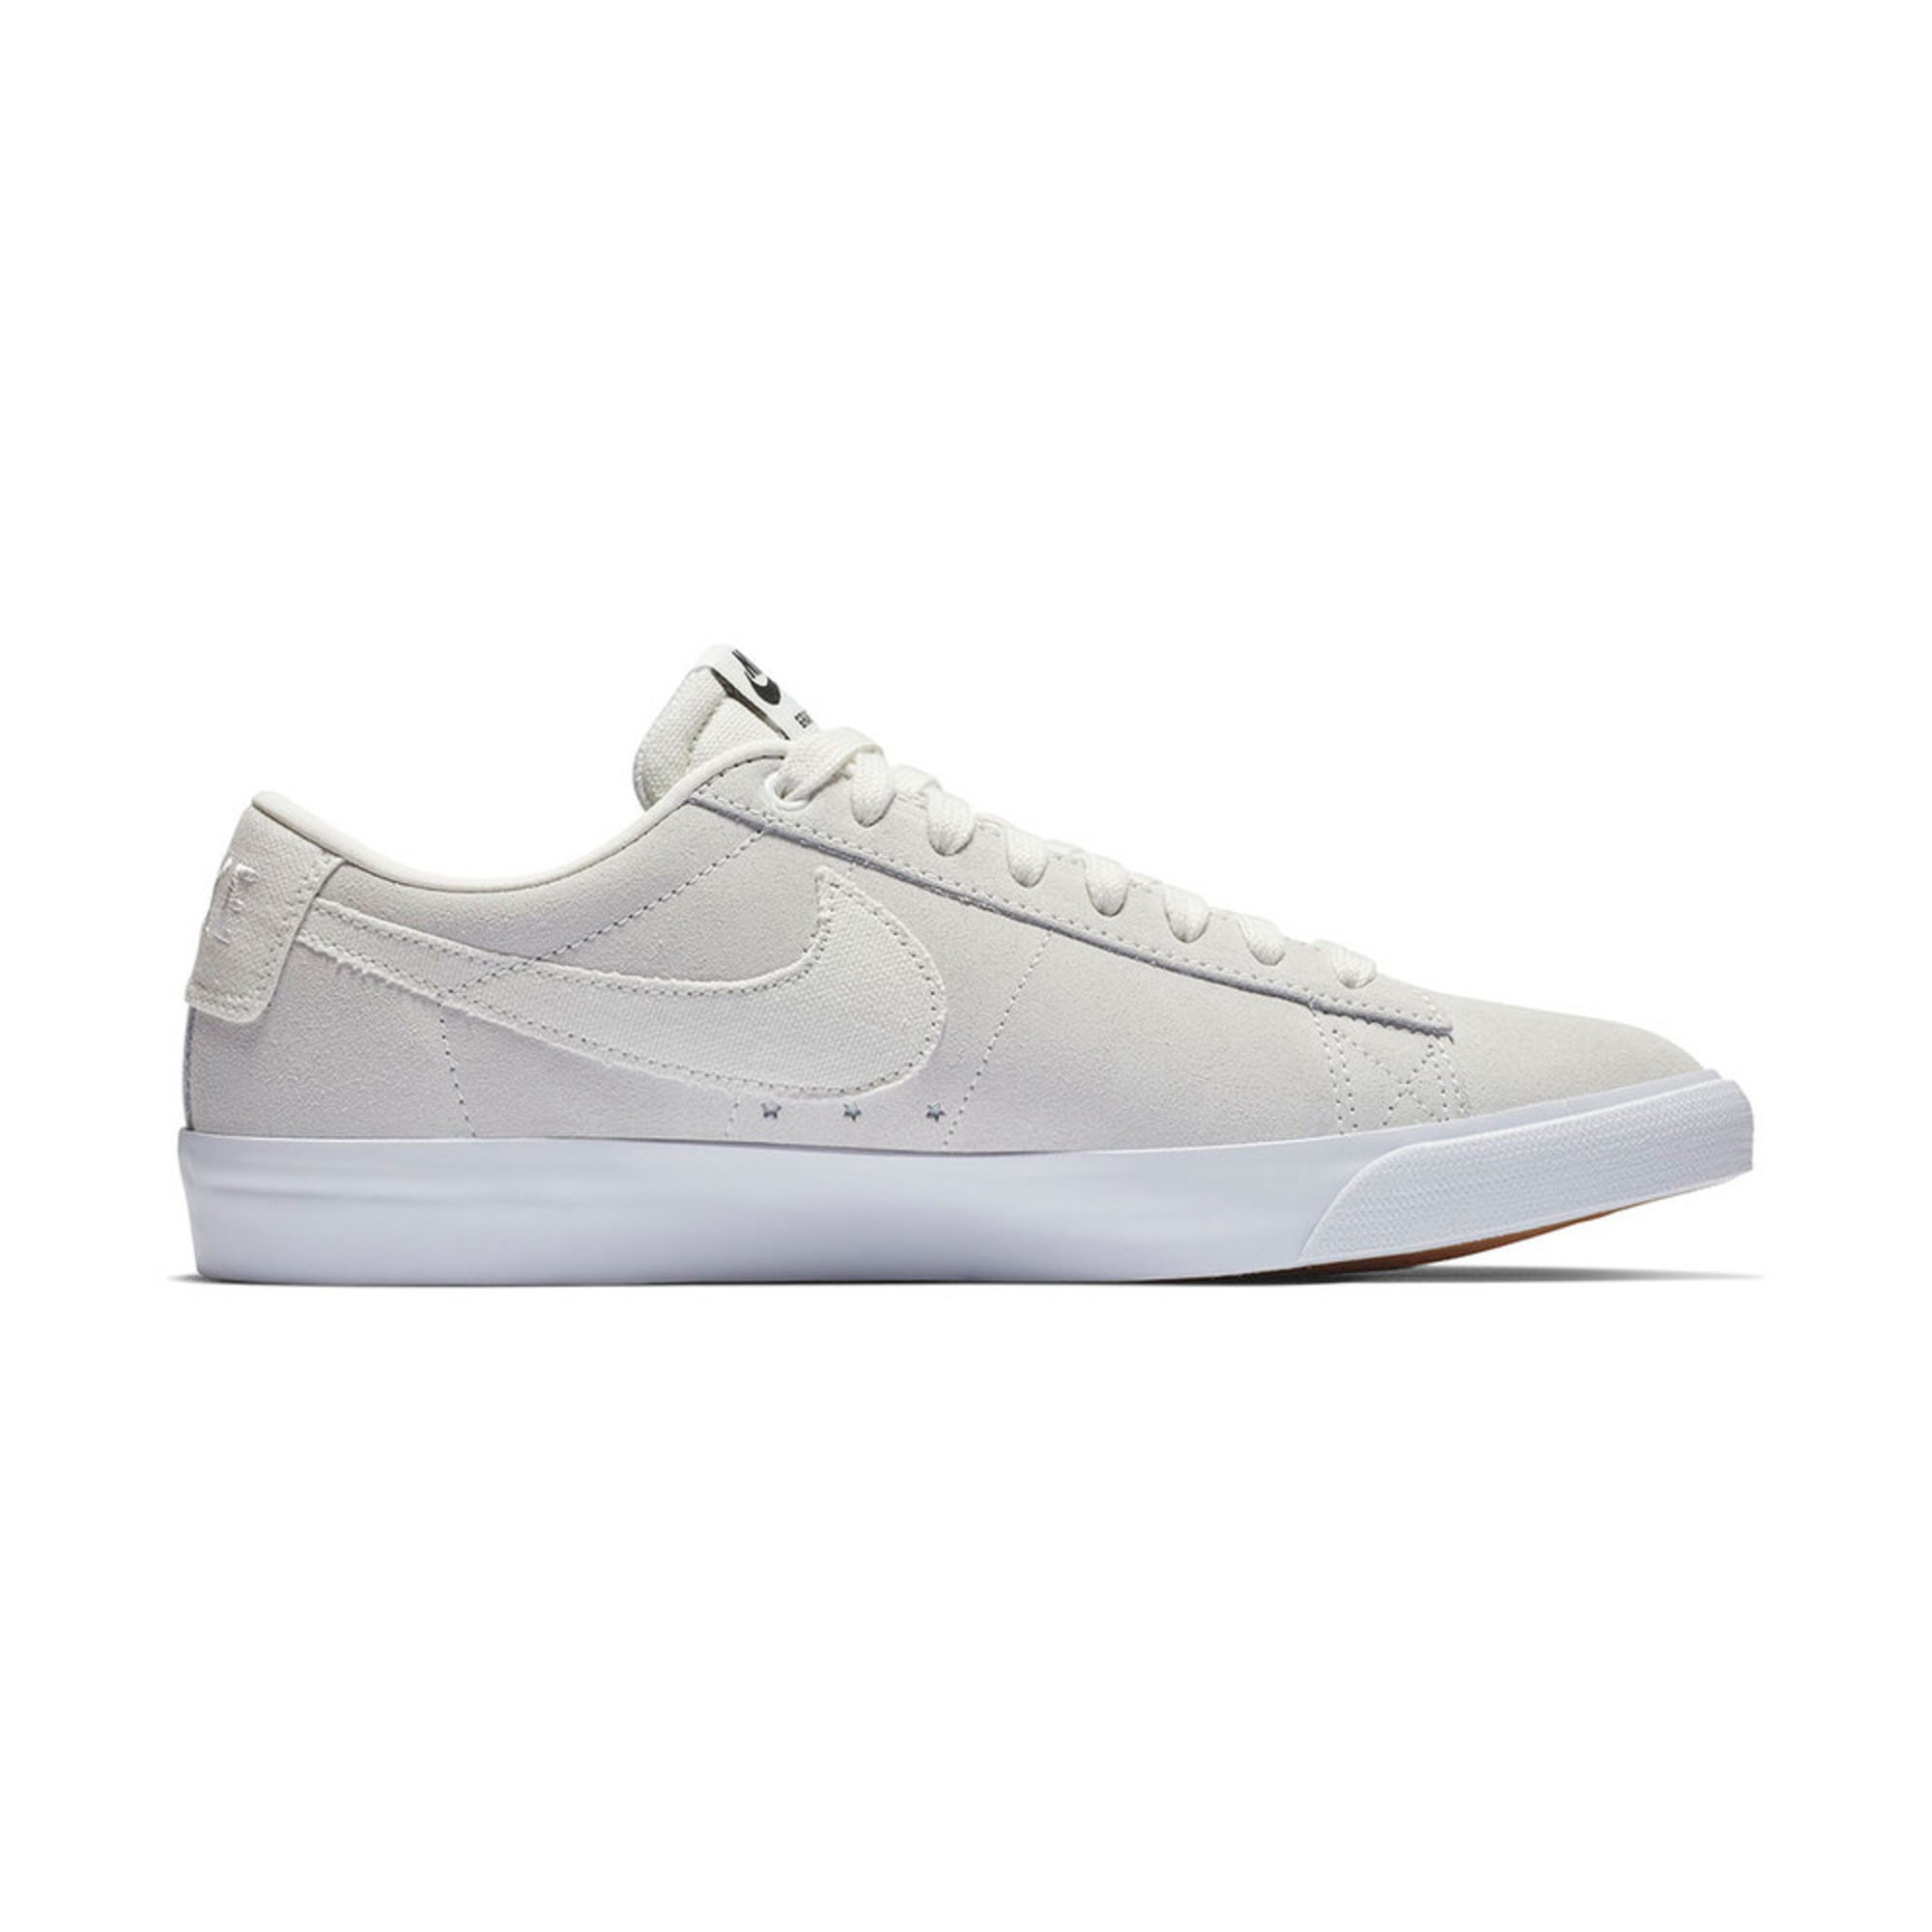 582a3fd82836 Nike SB. Nike SB Men s Zoom Blazer Low GT Skate Shoe